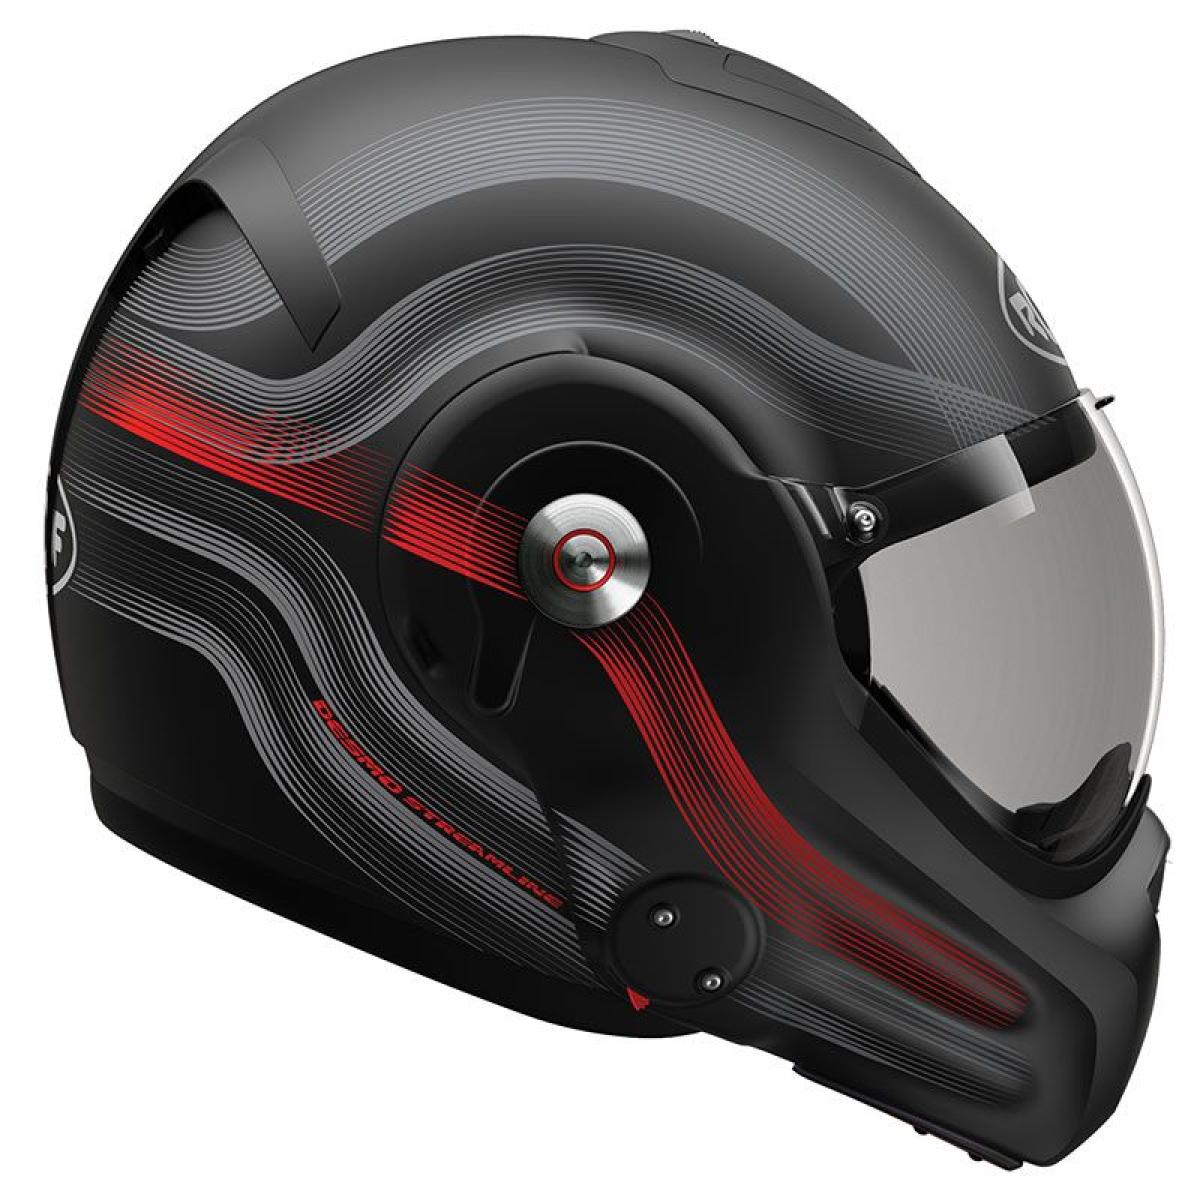 casque moto convertible roof desmo streamline noir titane rouge mat. Black Bedroom Furniture Sets. Home Design Ideas